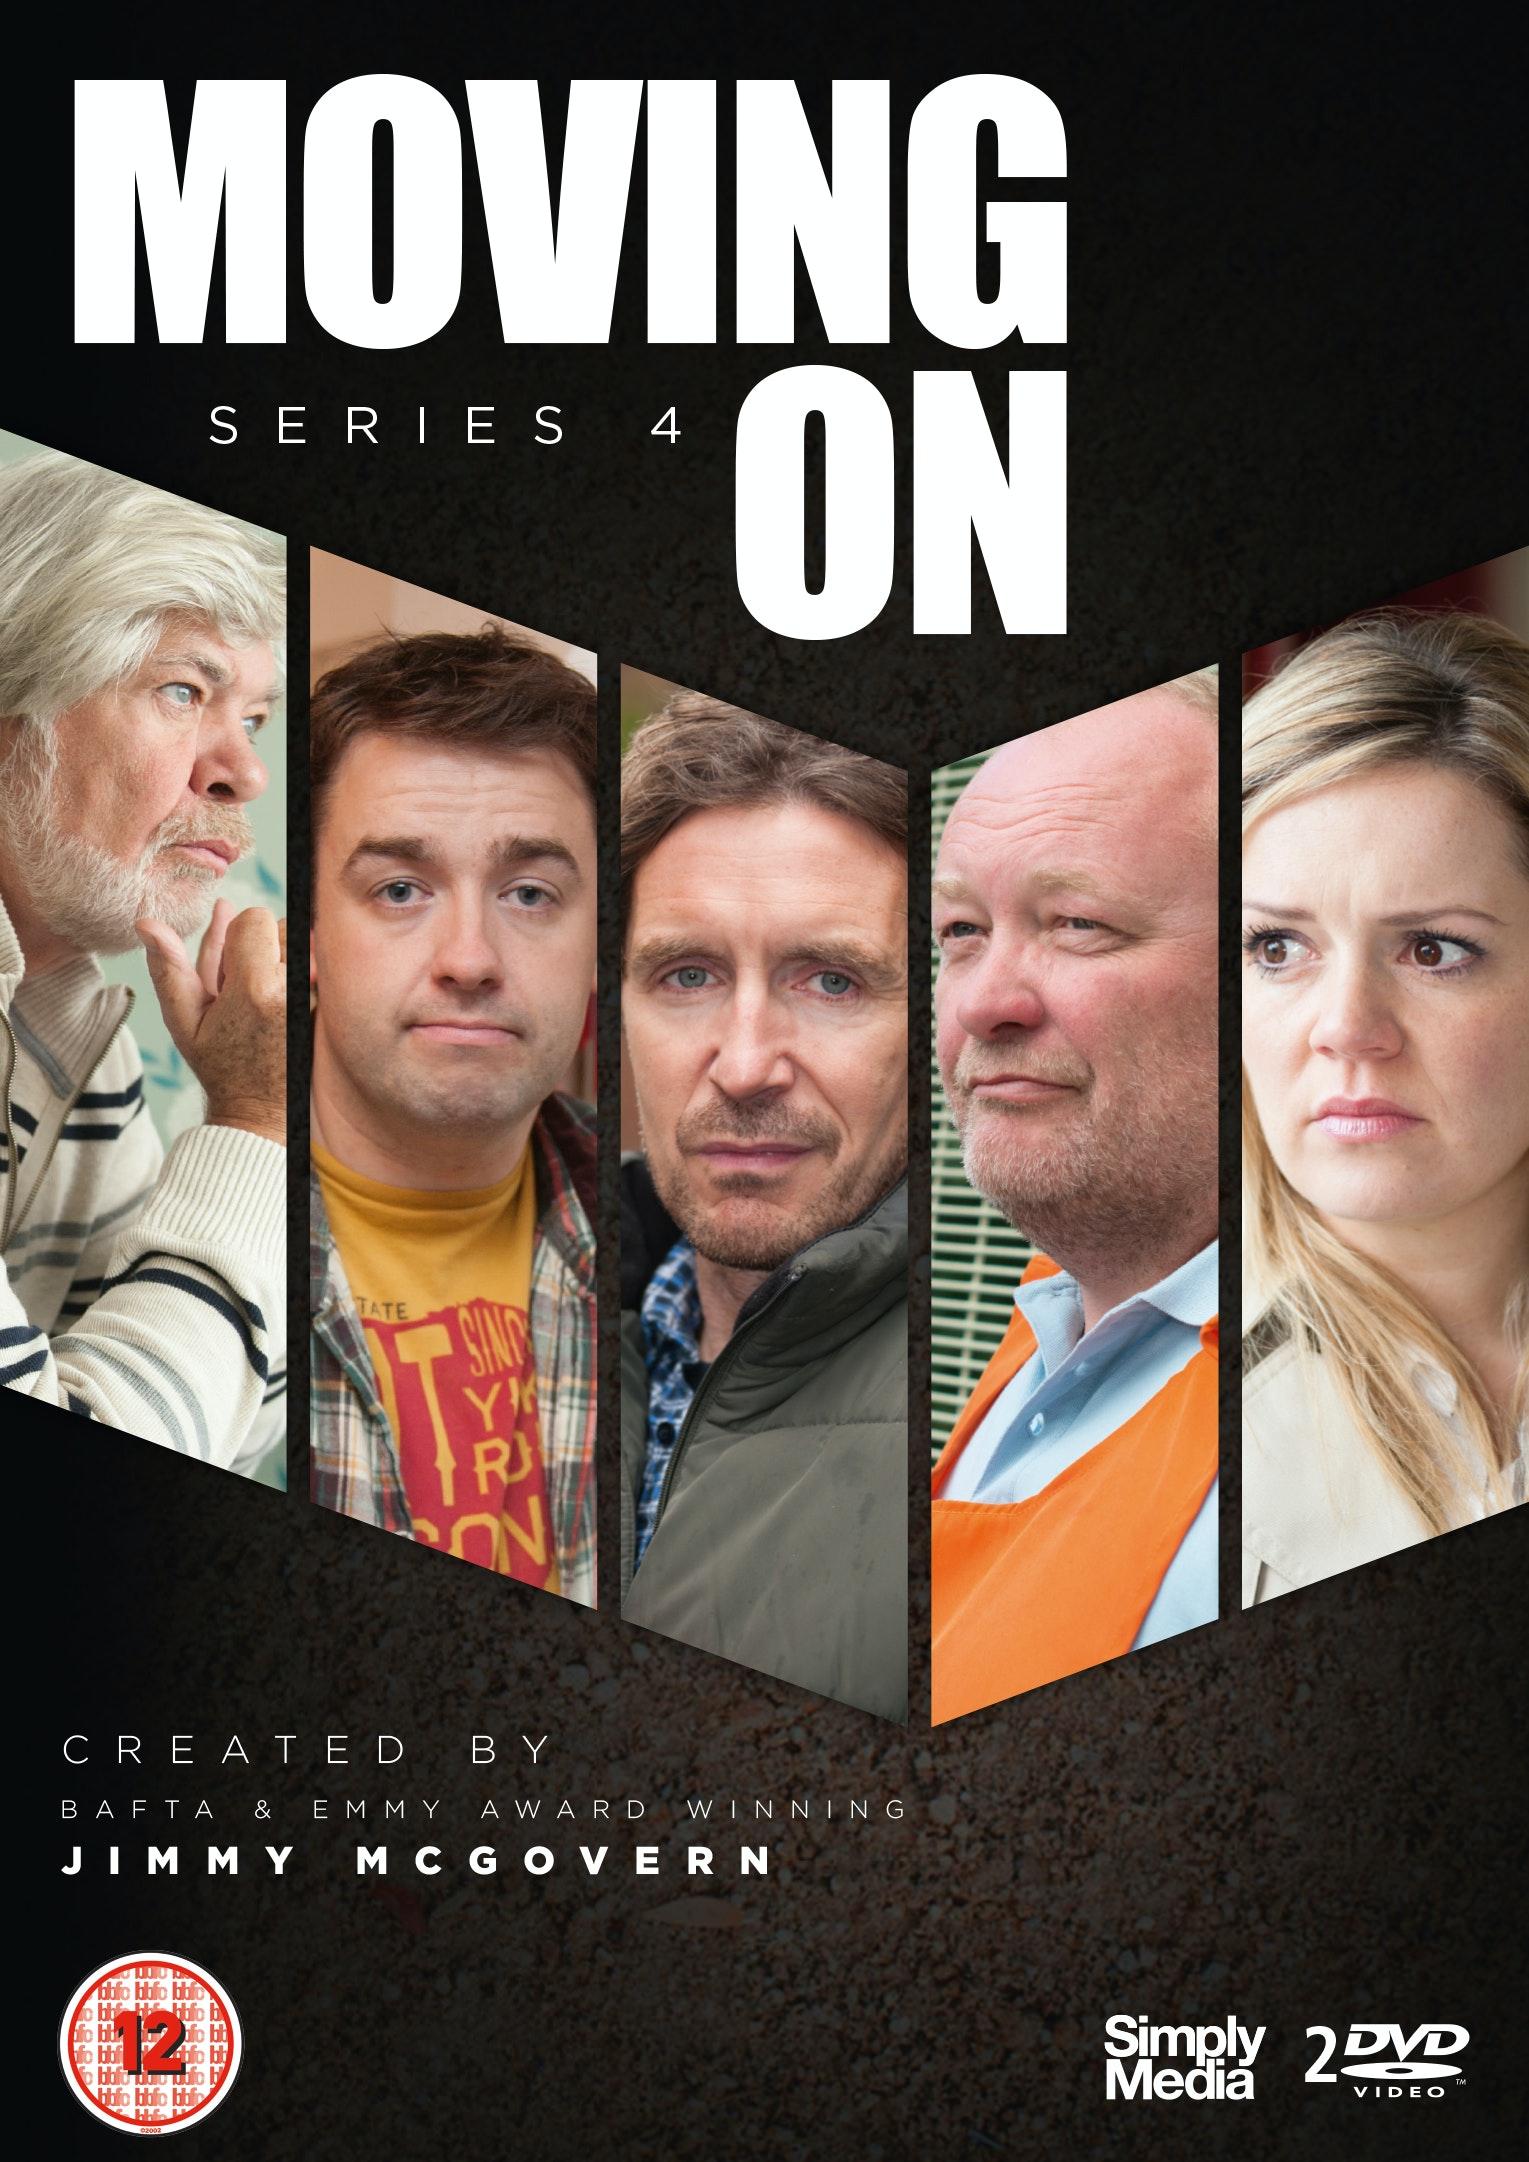 Moving On Series Four' starring Rob James-Collier, Matthew Kelly & Jason Manford  sweepstakes